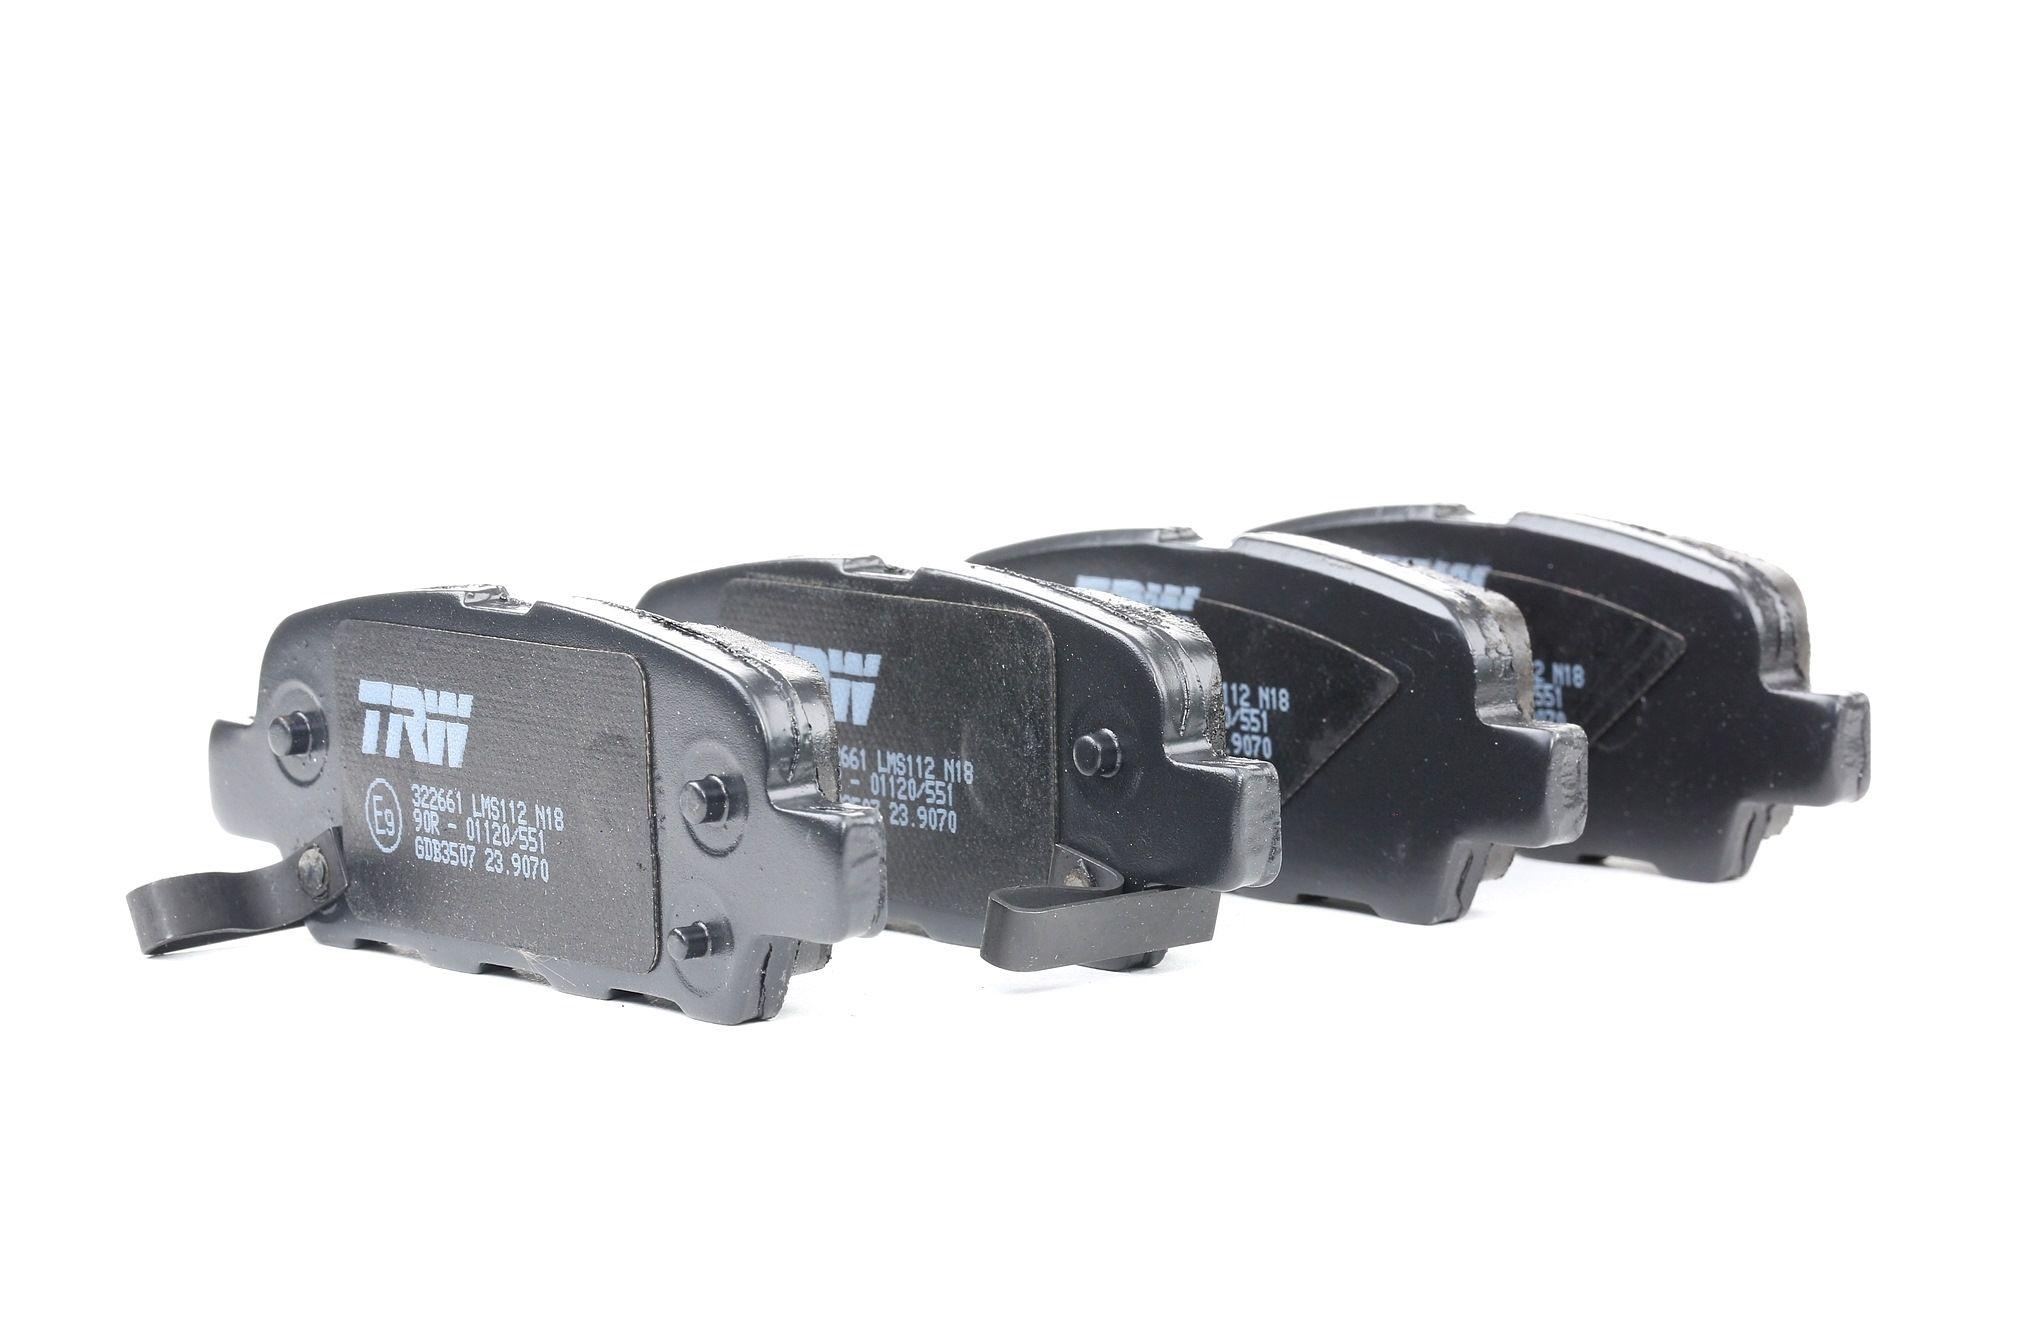 NISSAN PATHFINDER 2014 Bremsbelagsatz - Original TRW GDB3507 Höhe: 38,0mm, Dicke/Stärke: 14,0mm